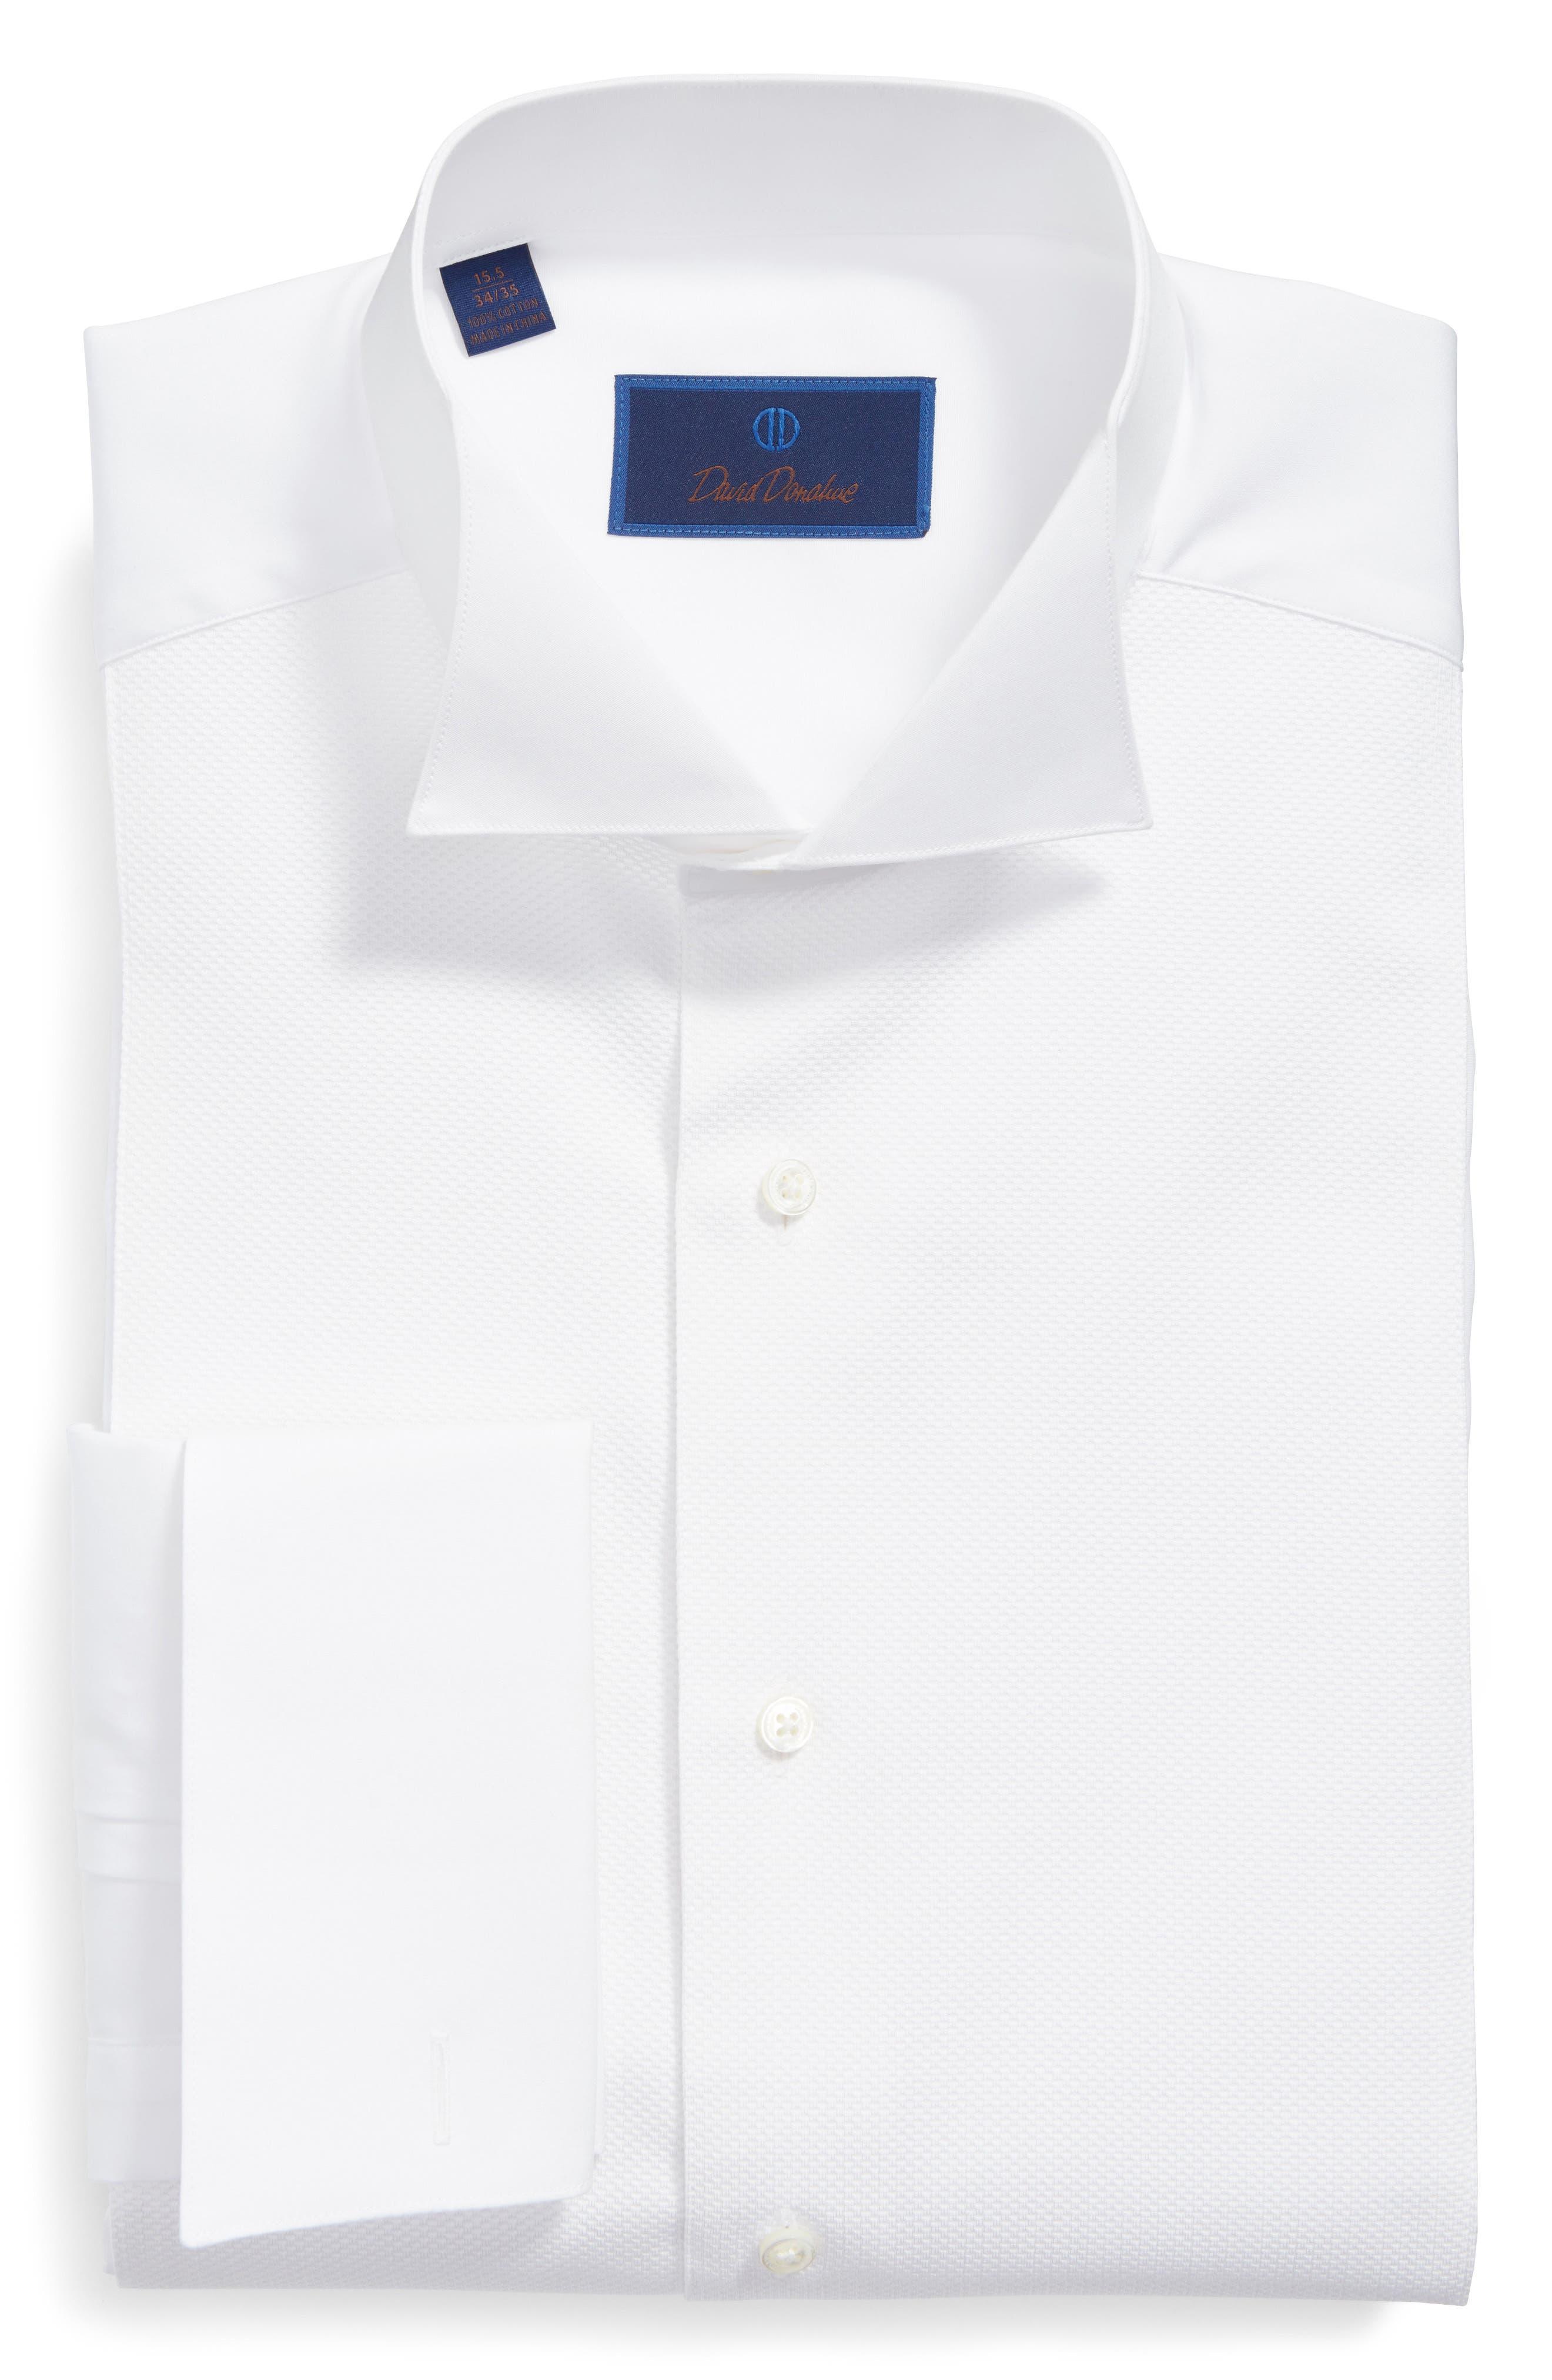 Main Image - David Donahue Regular Fit French Cuff Tuxedo Shirt